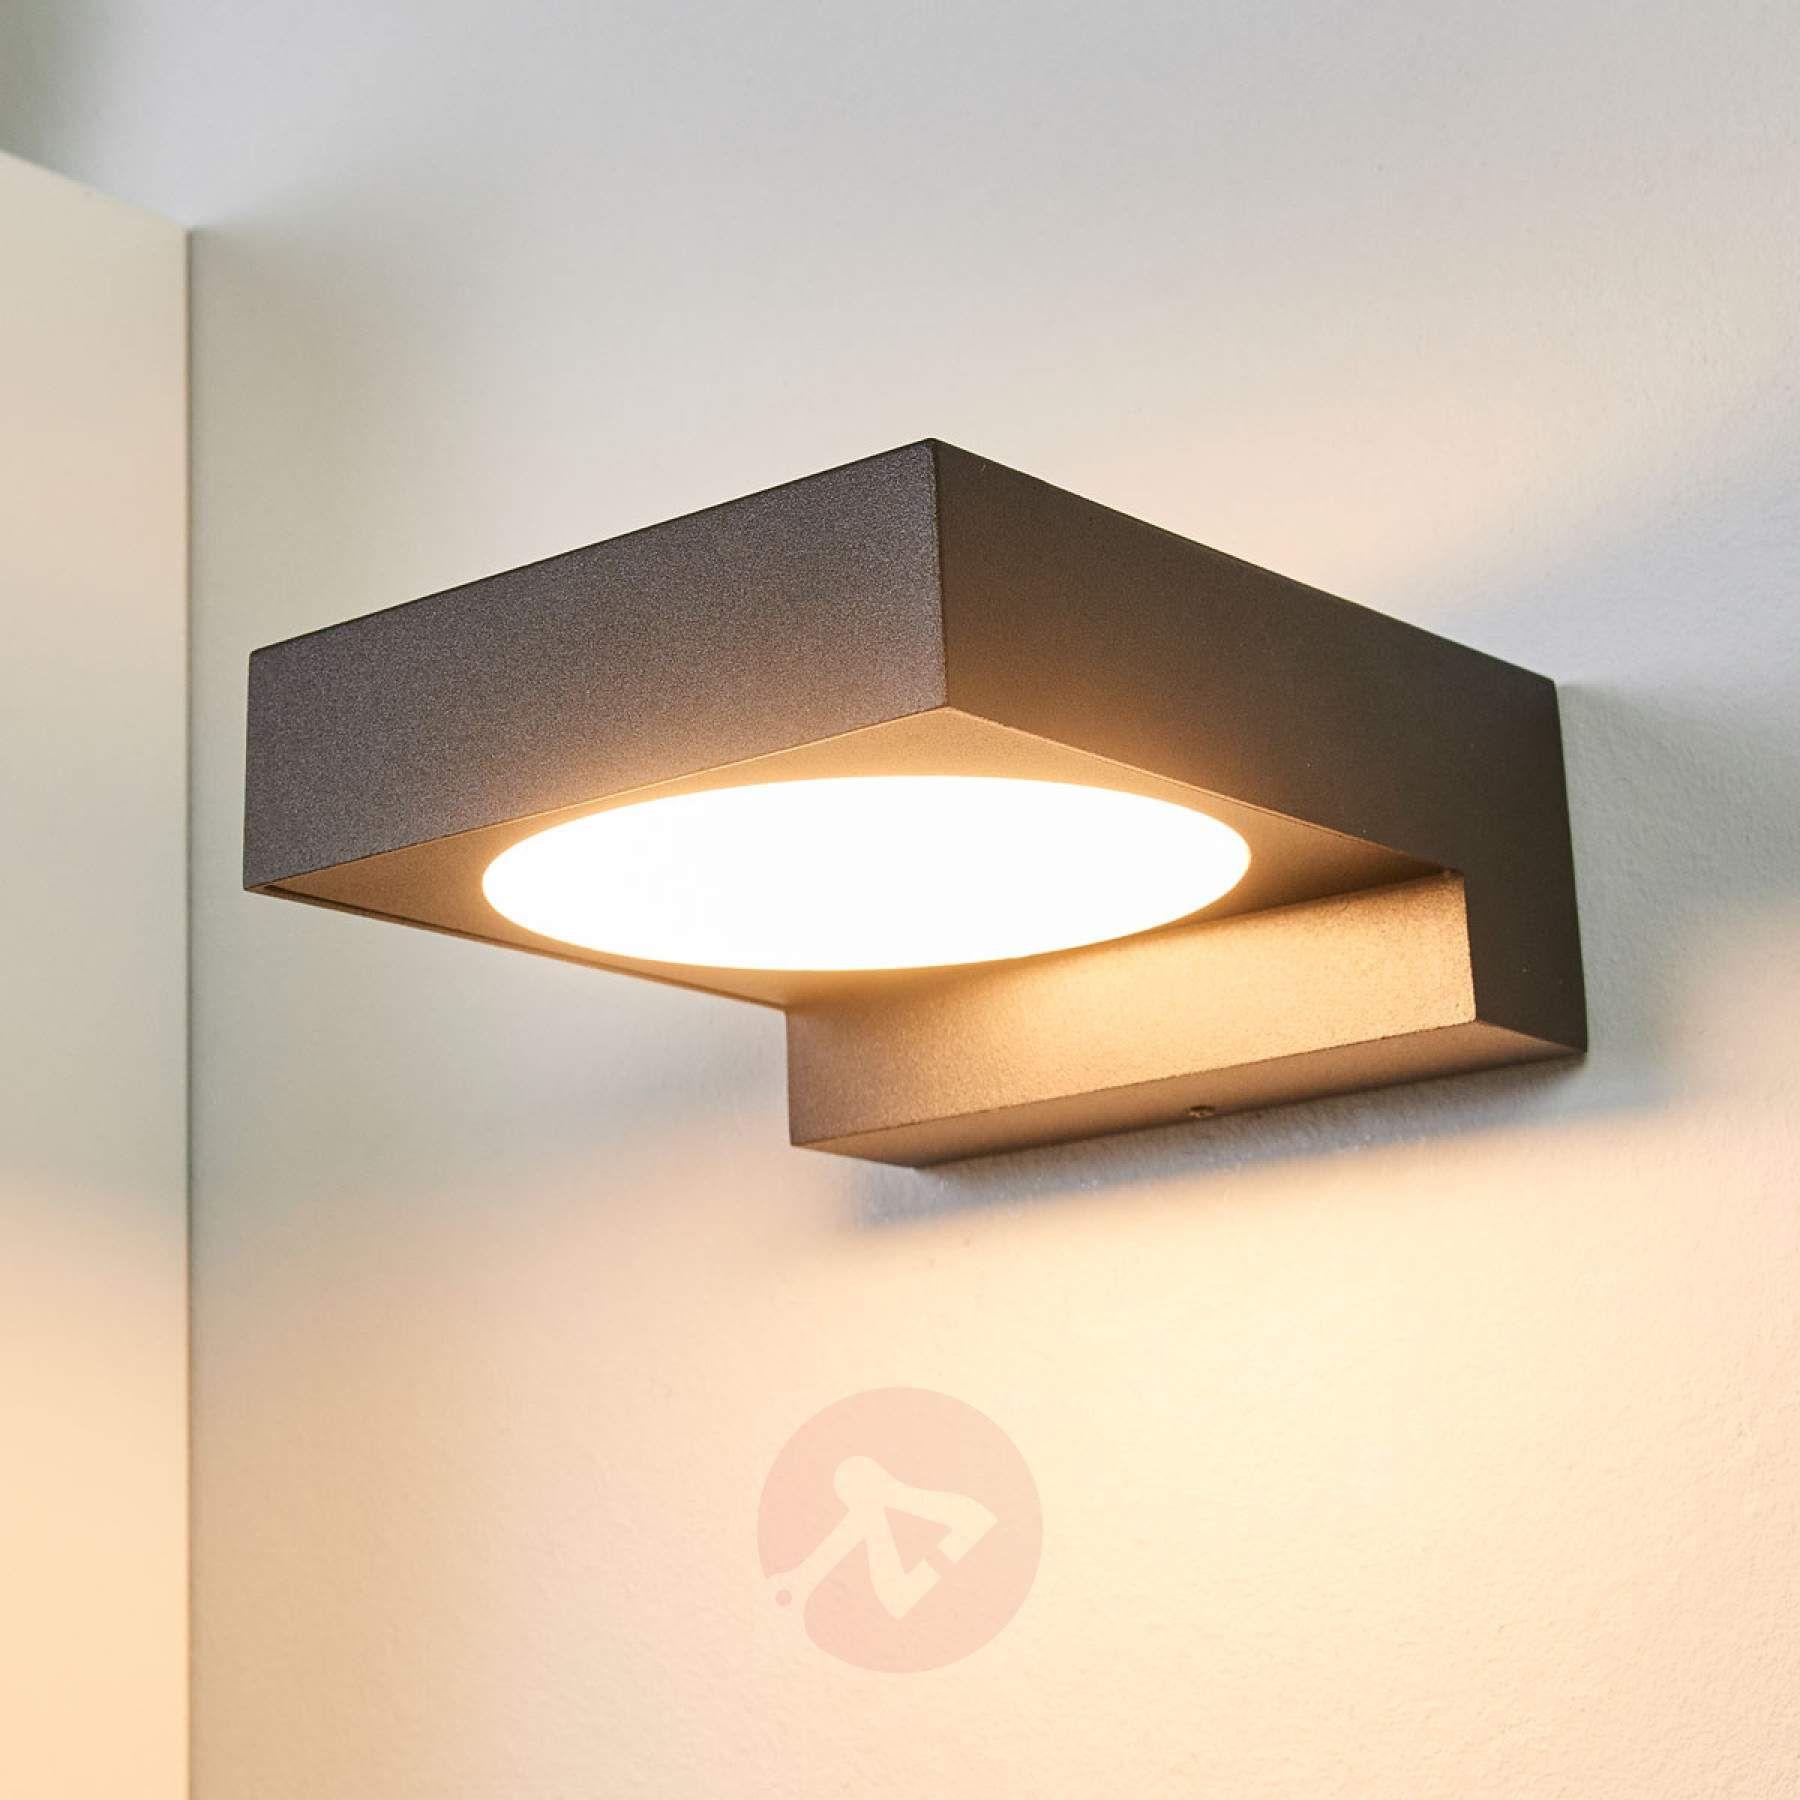 Schwarze Led Aussenwandlampe Natalja Kaufen Lampenwelt De In 2020 Aussenwandlampen Lampe Lampendesign